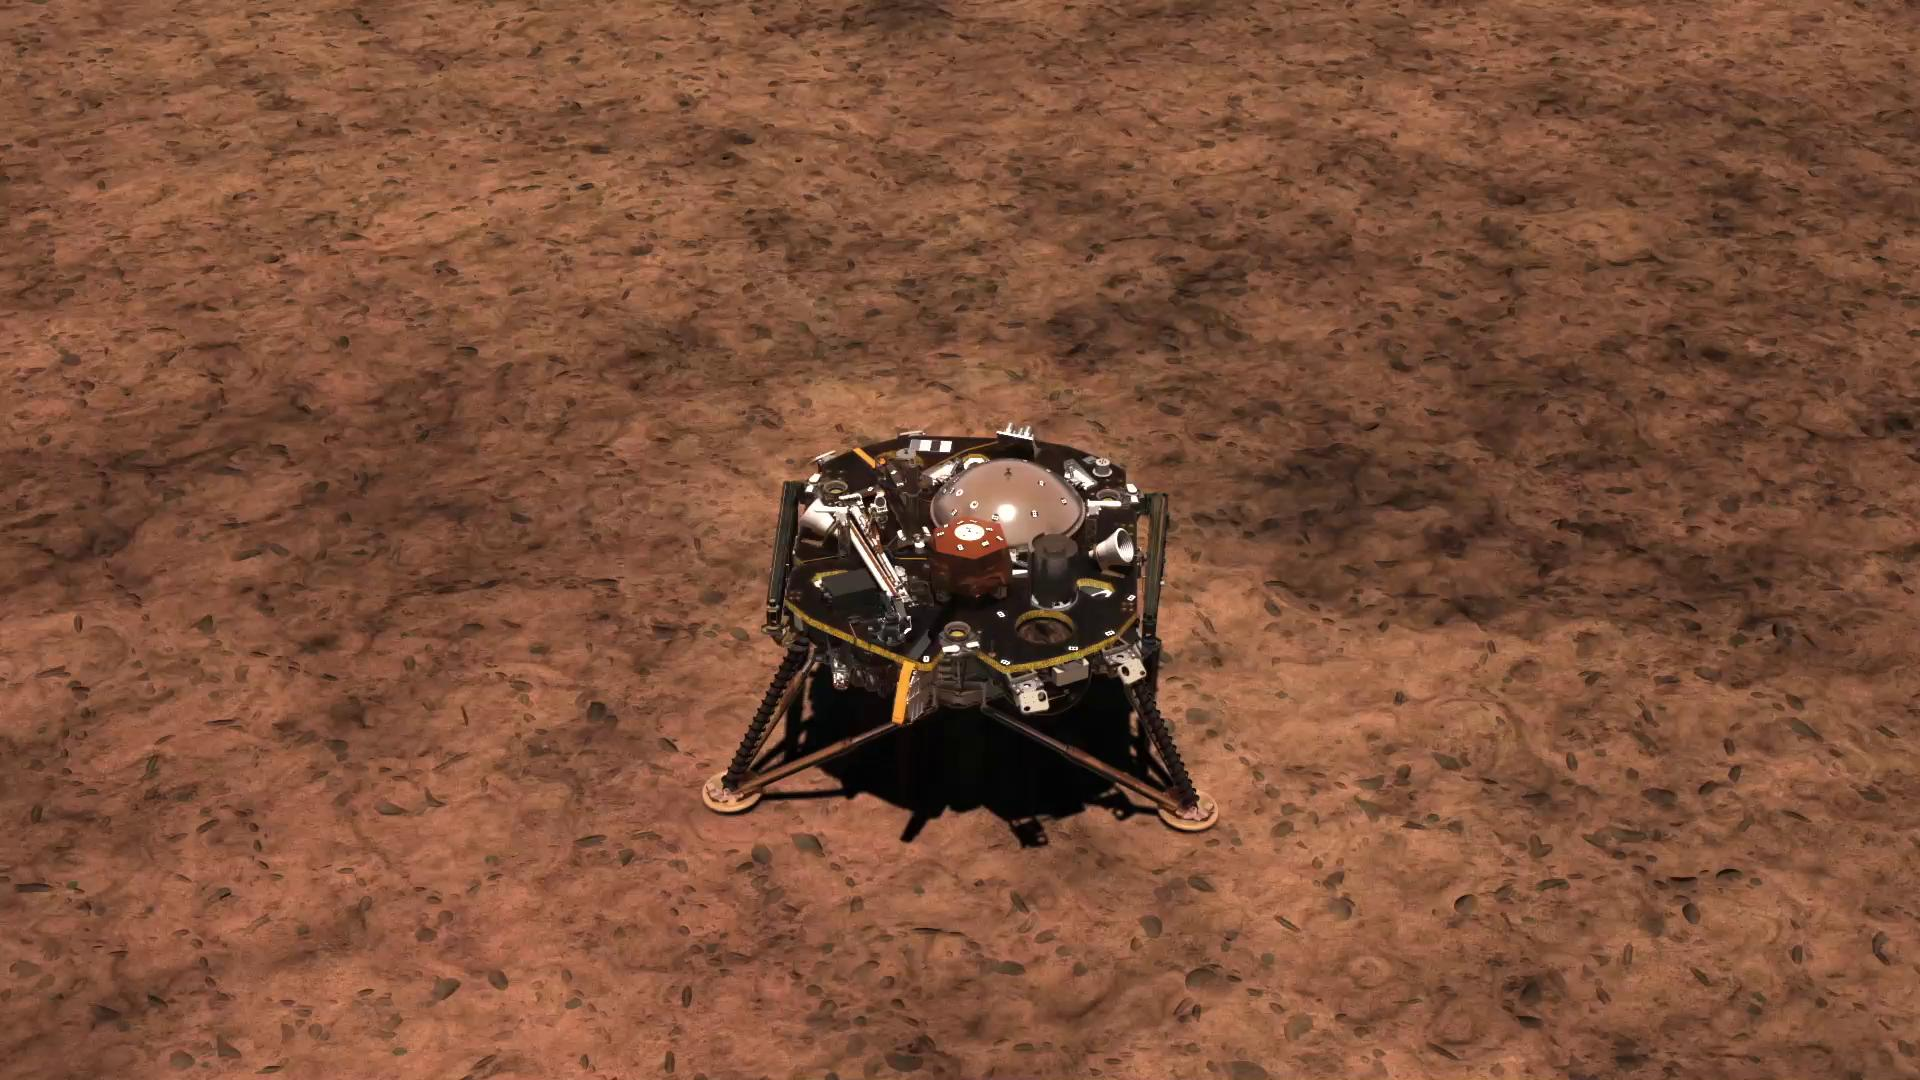 mars insight landing animation - photo #12